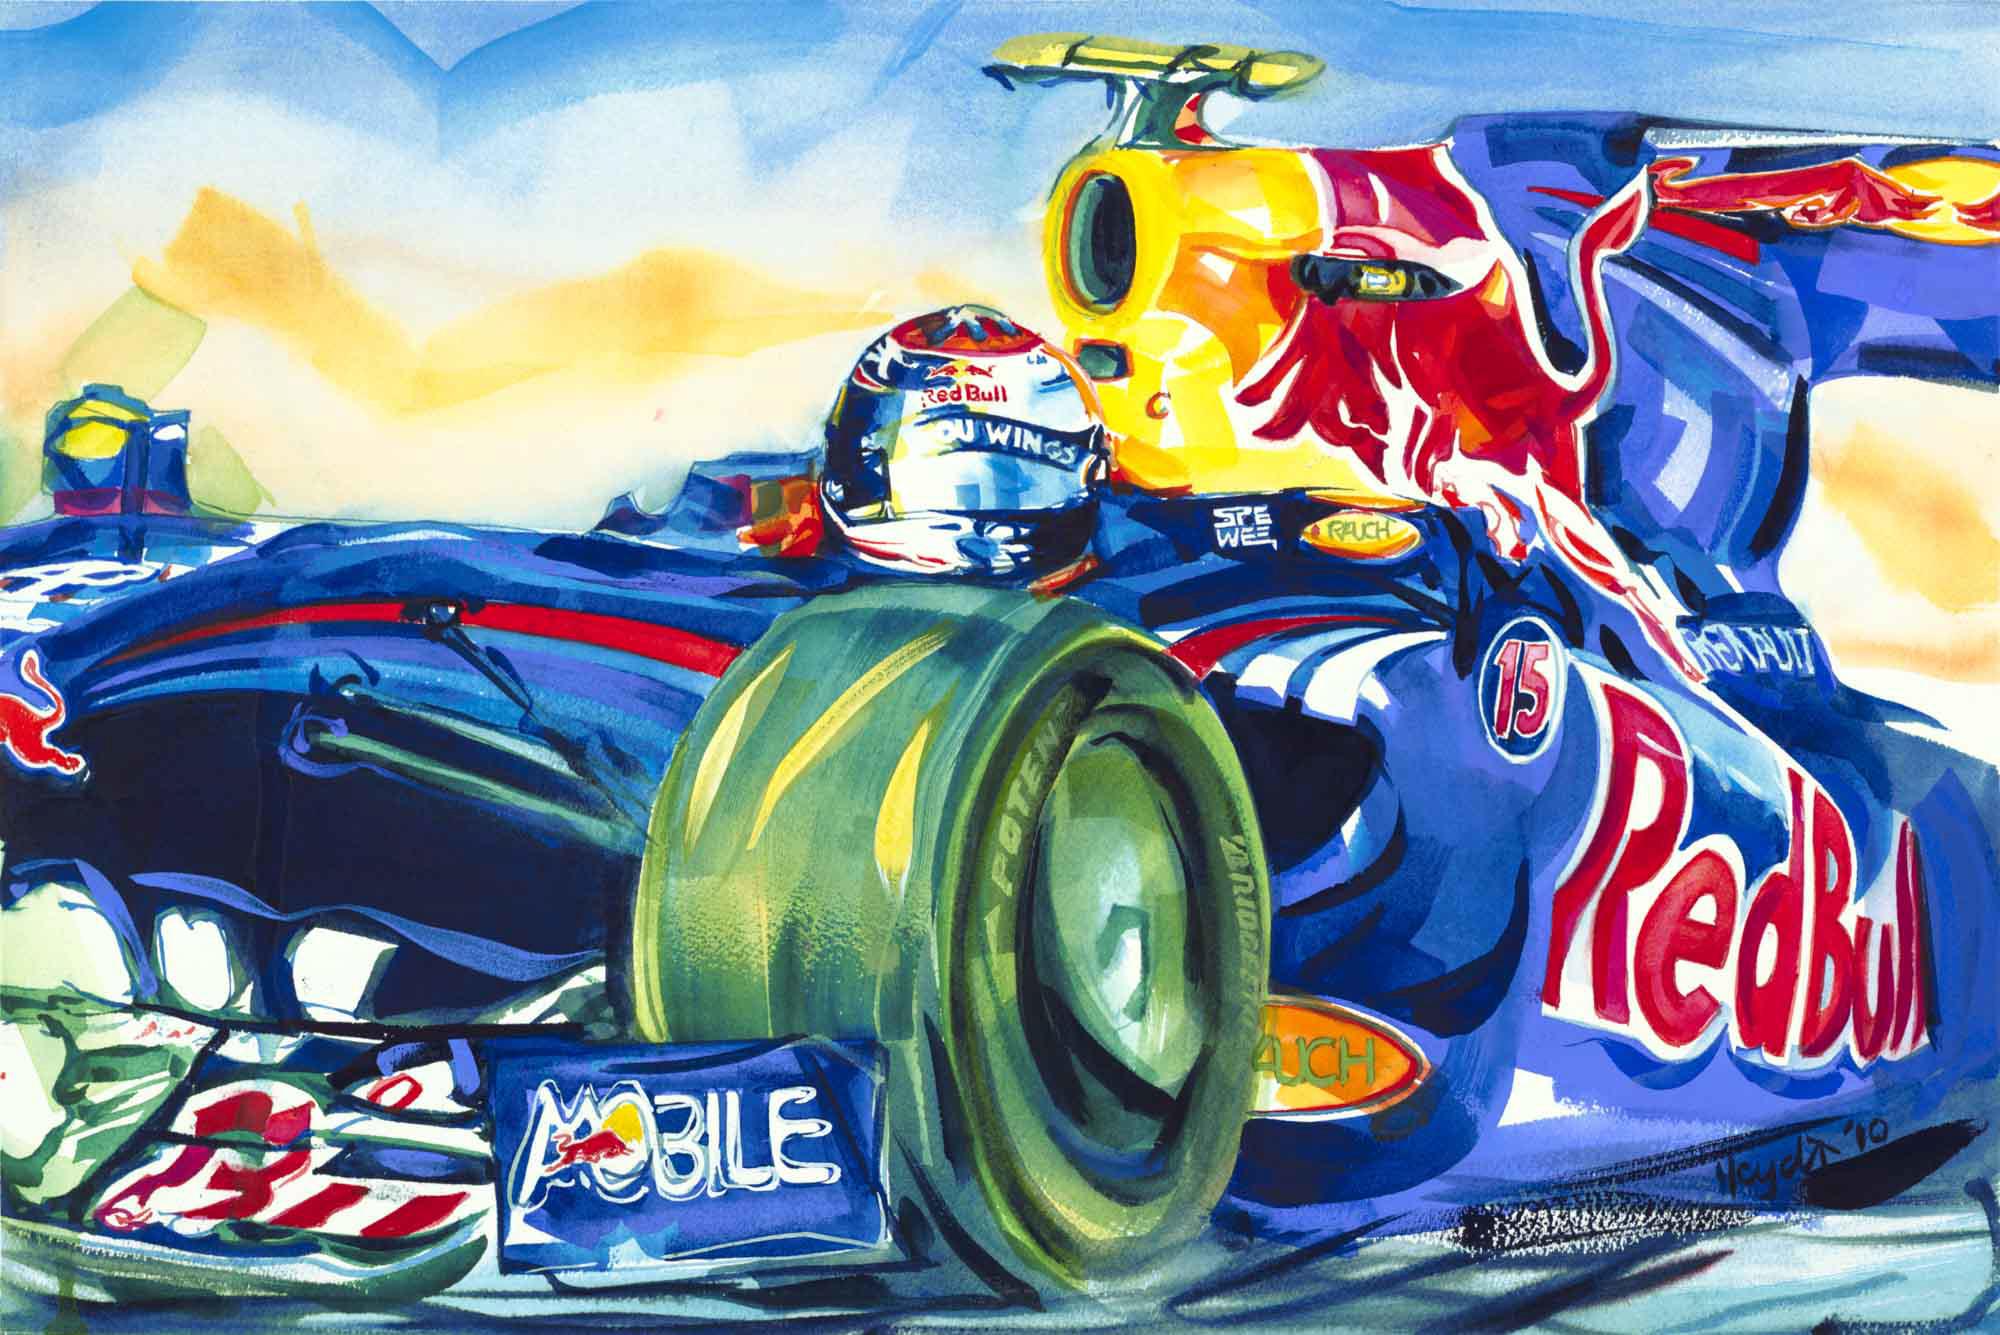 Formula1-wHEYDT-red bull up close.jpg